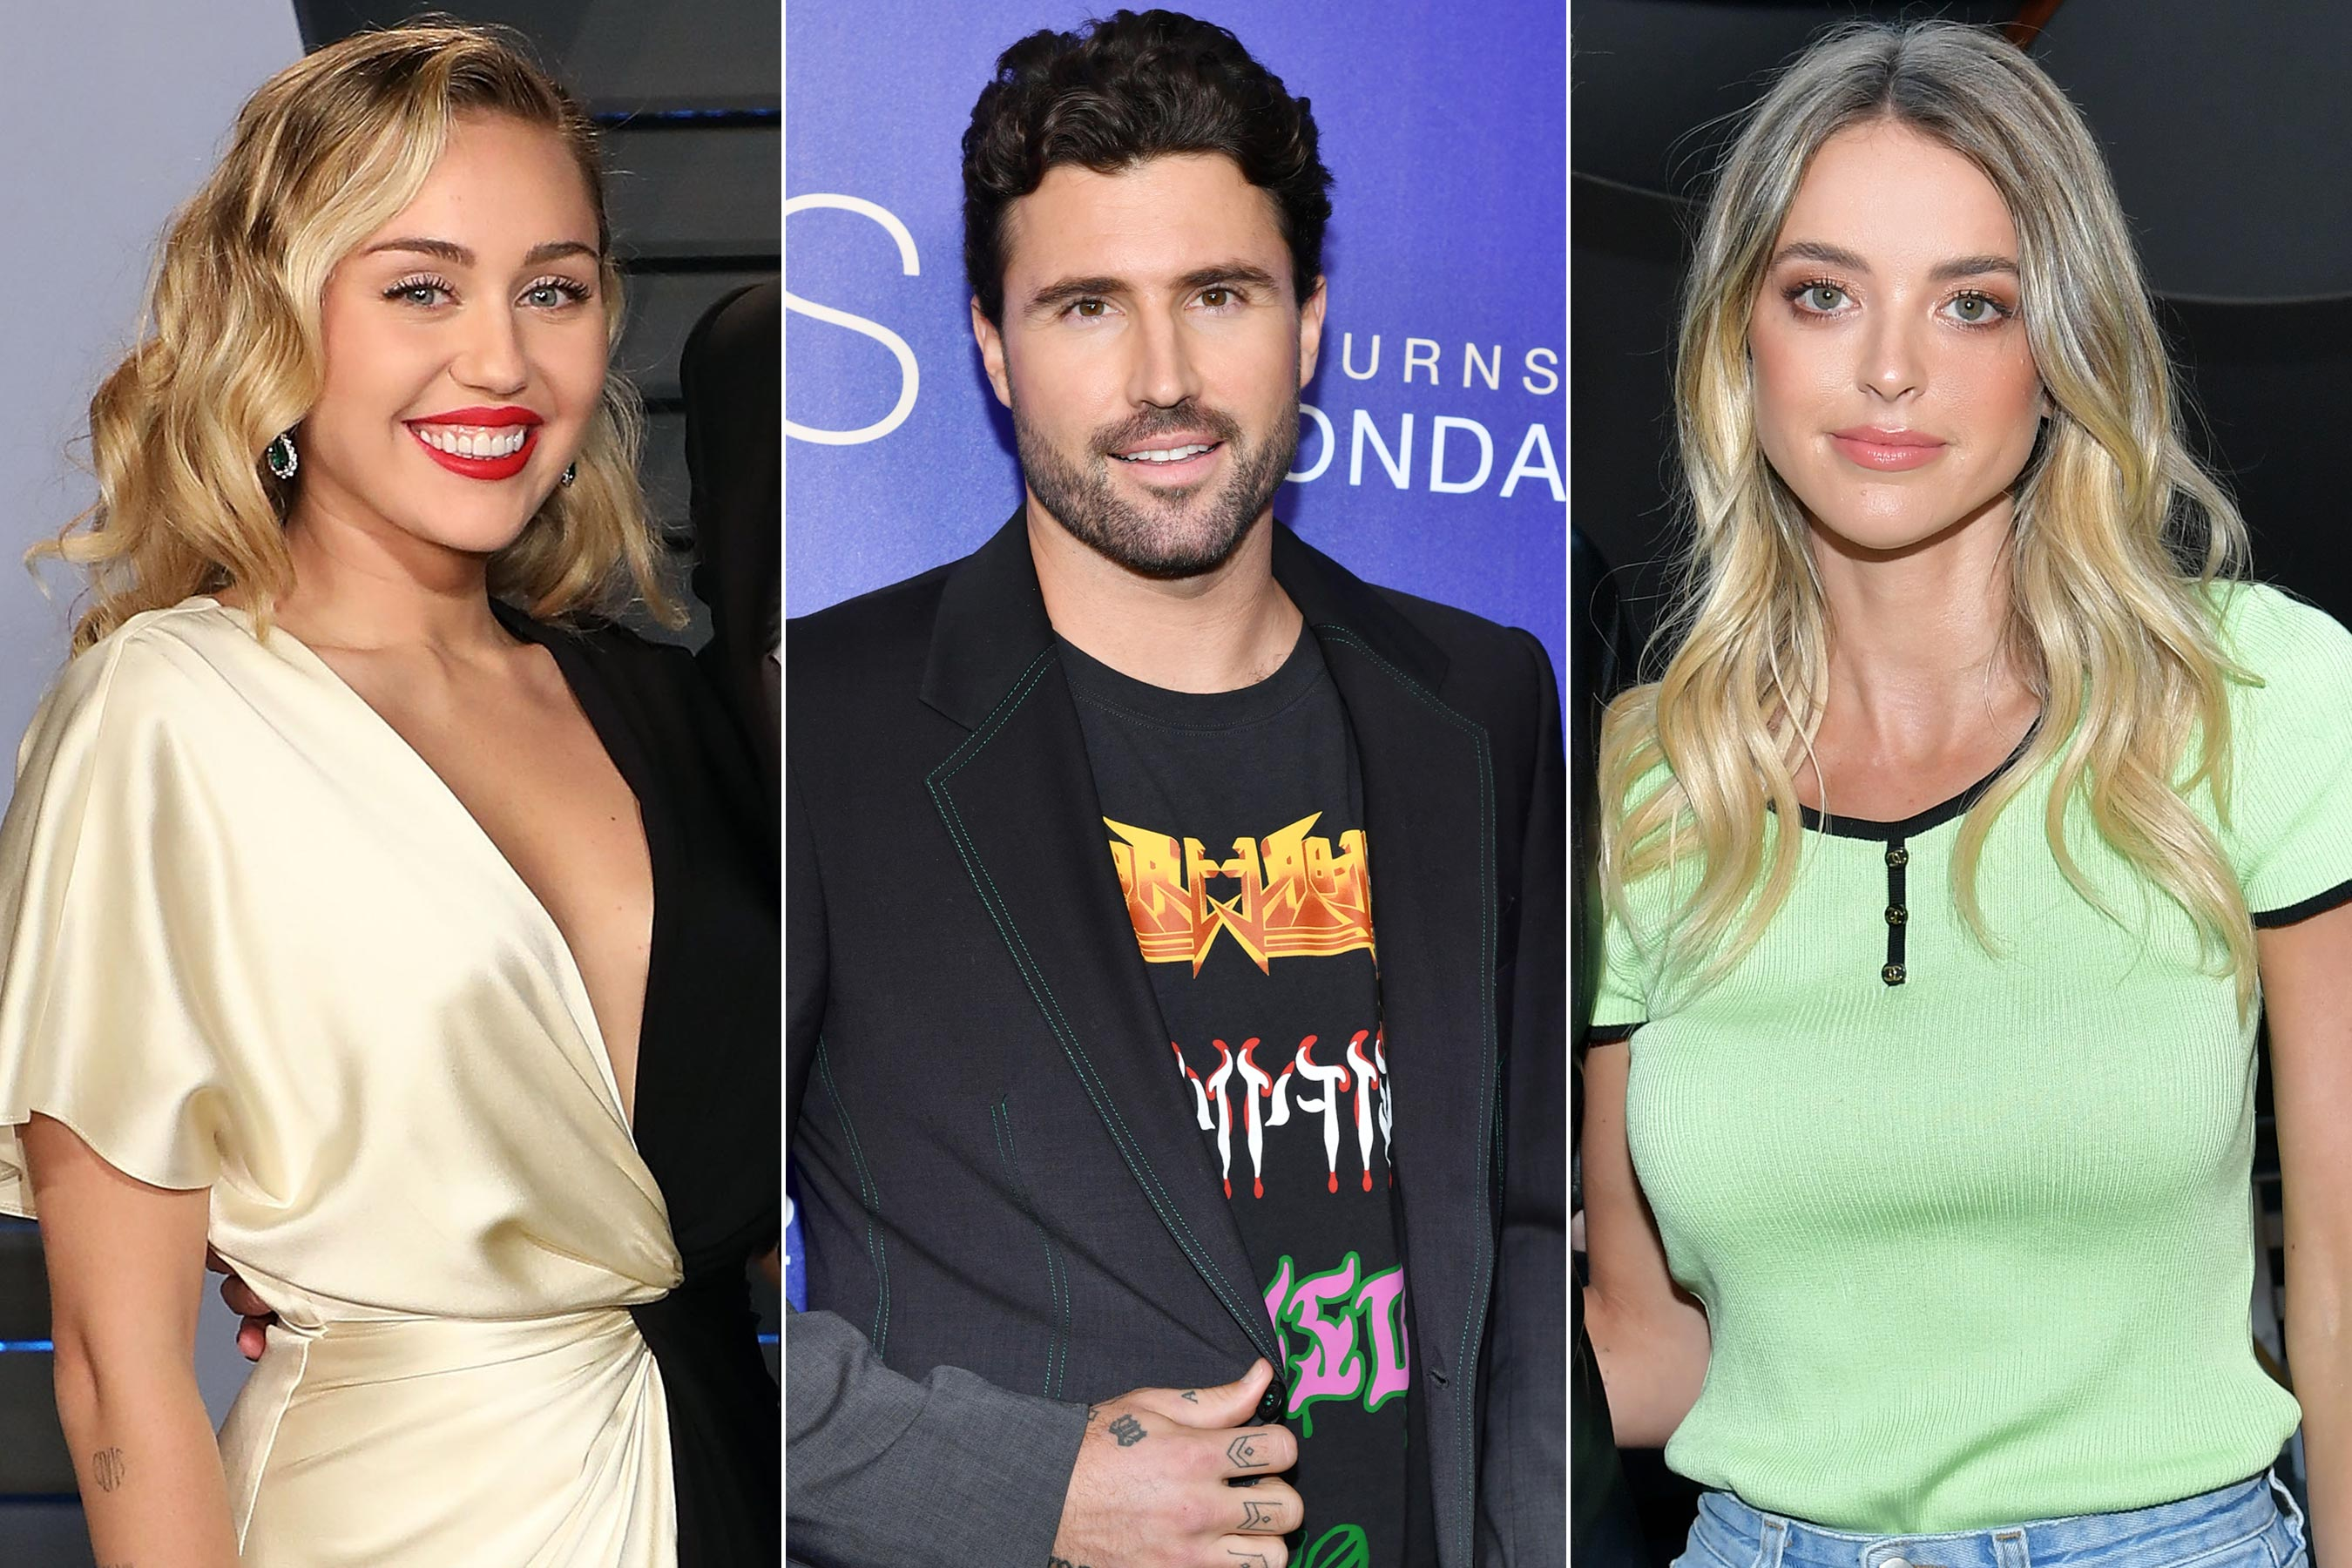 Miley Cirus, Brody Jenner, Kaitlynn Carter